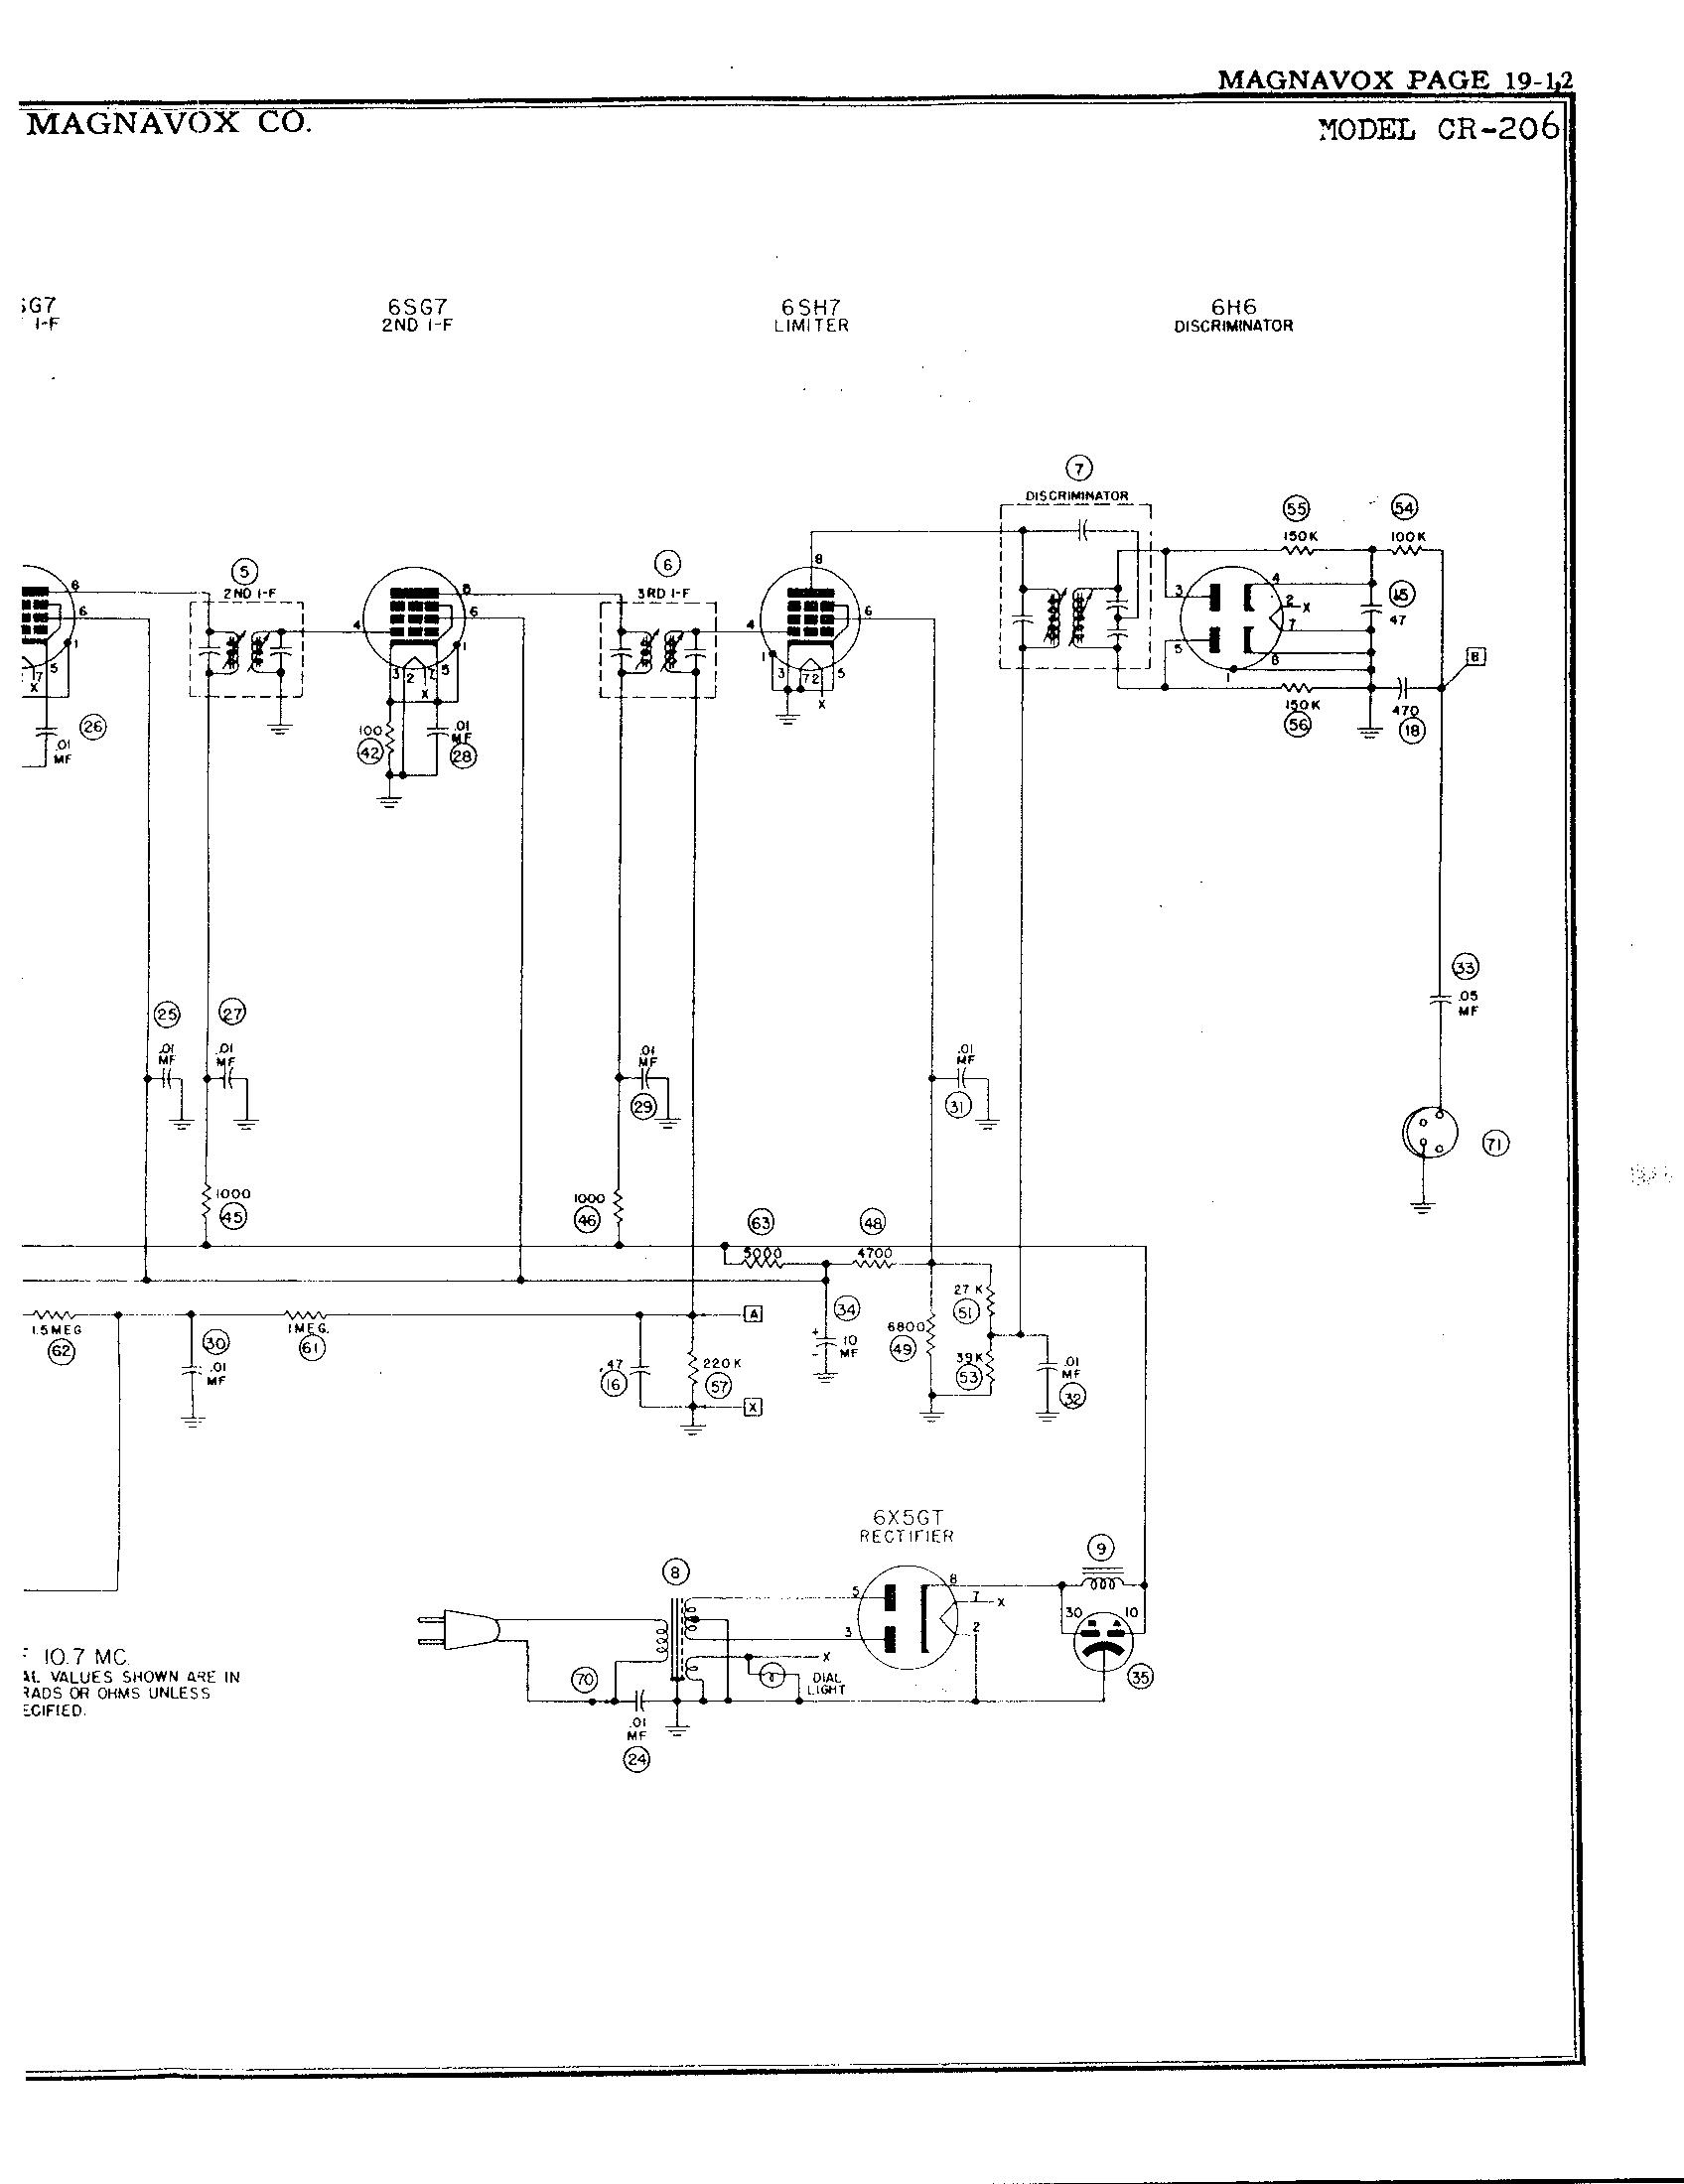 Magnavox Plug Wiring Diagram | Wiring Liry on